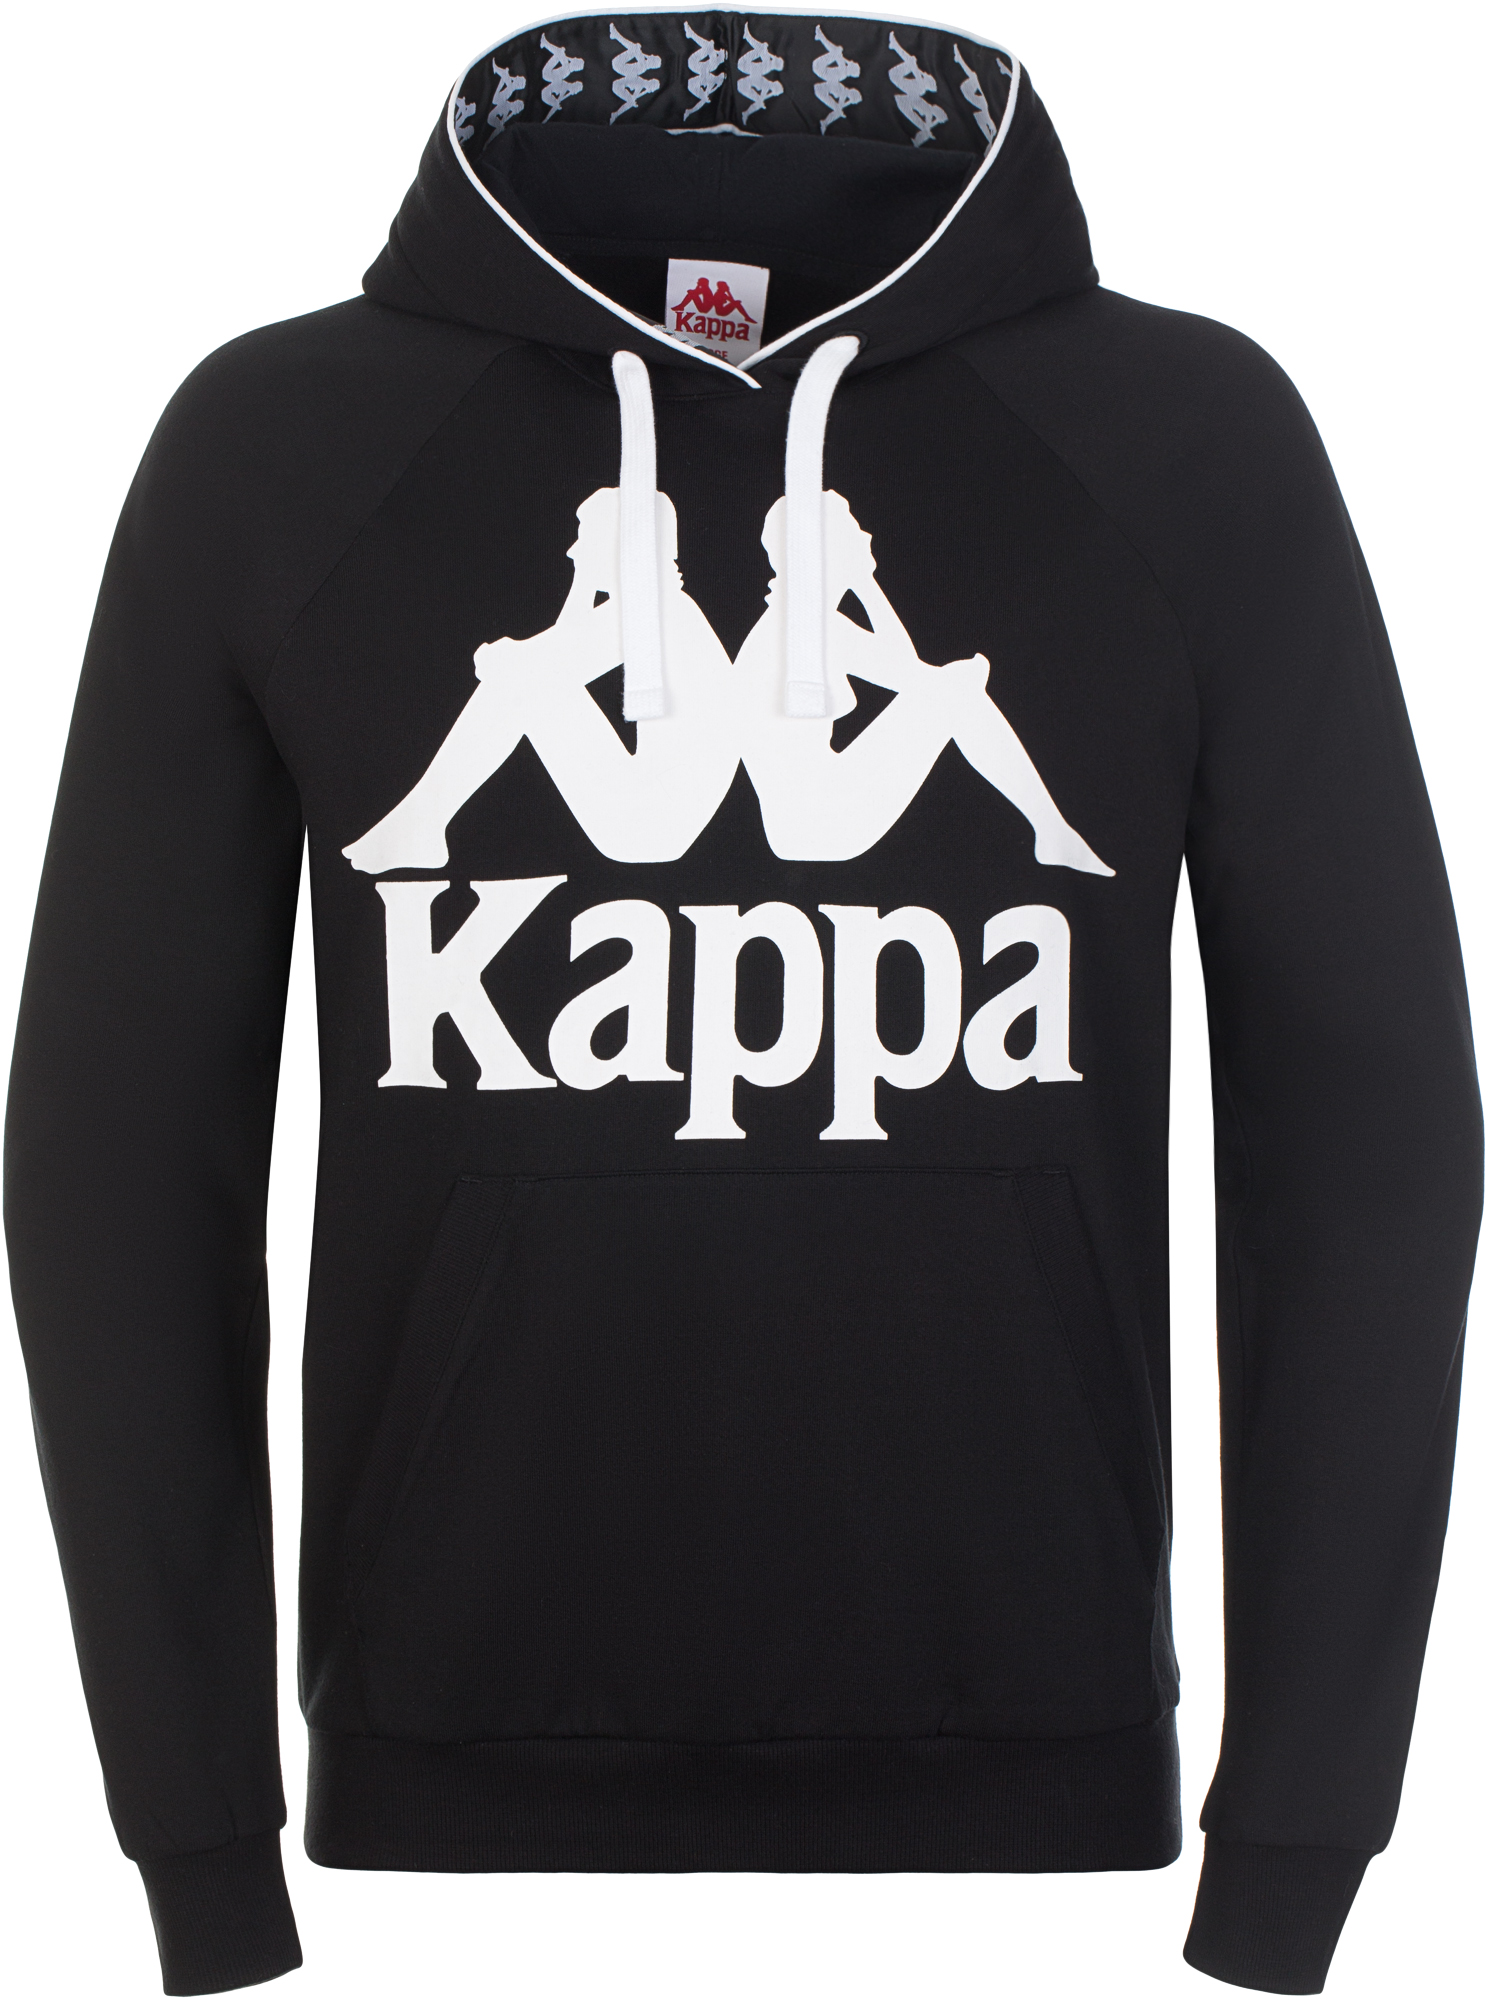 Kappa Худи мужская Kappa, размер 52